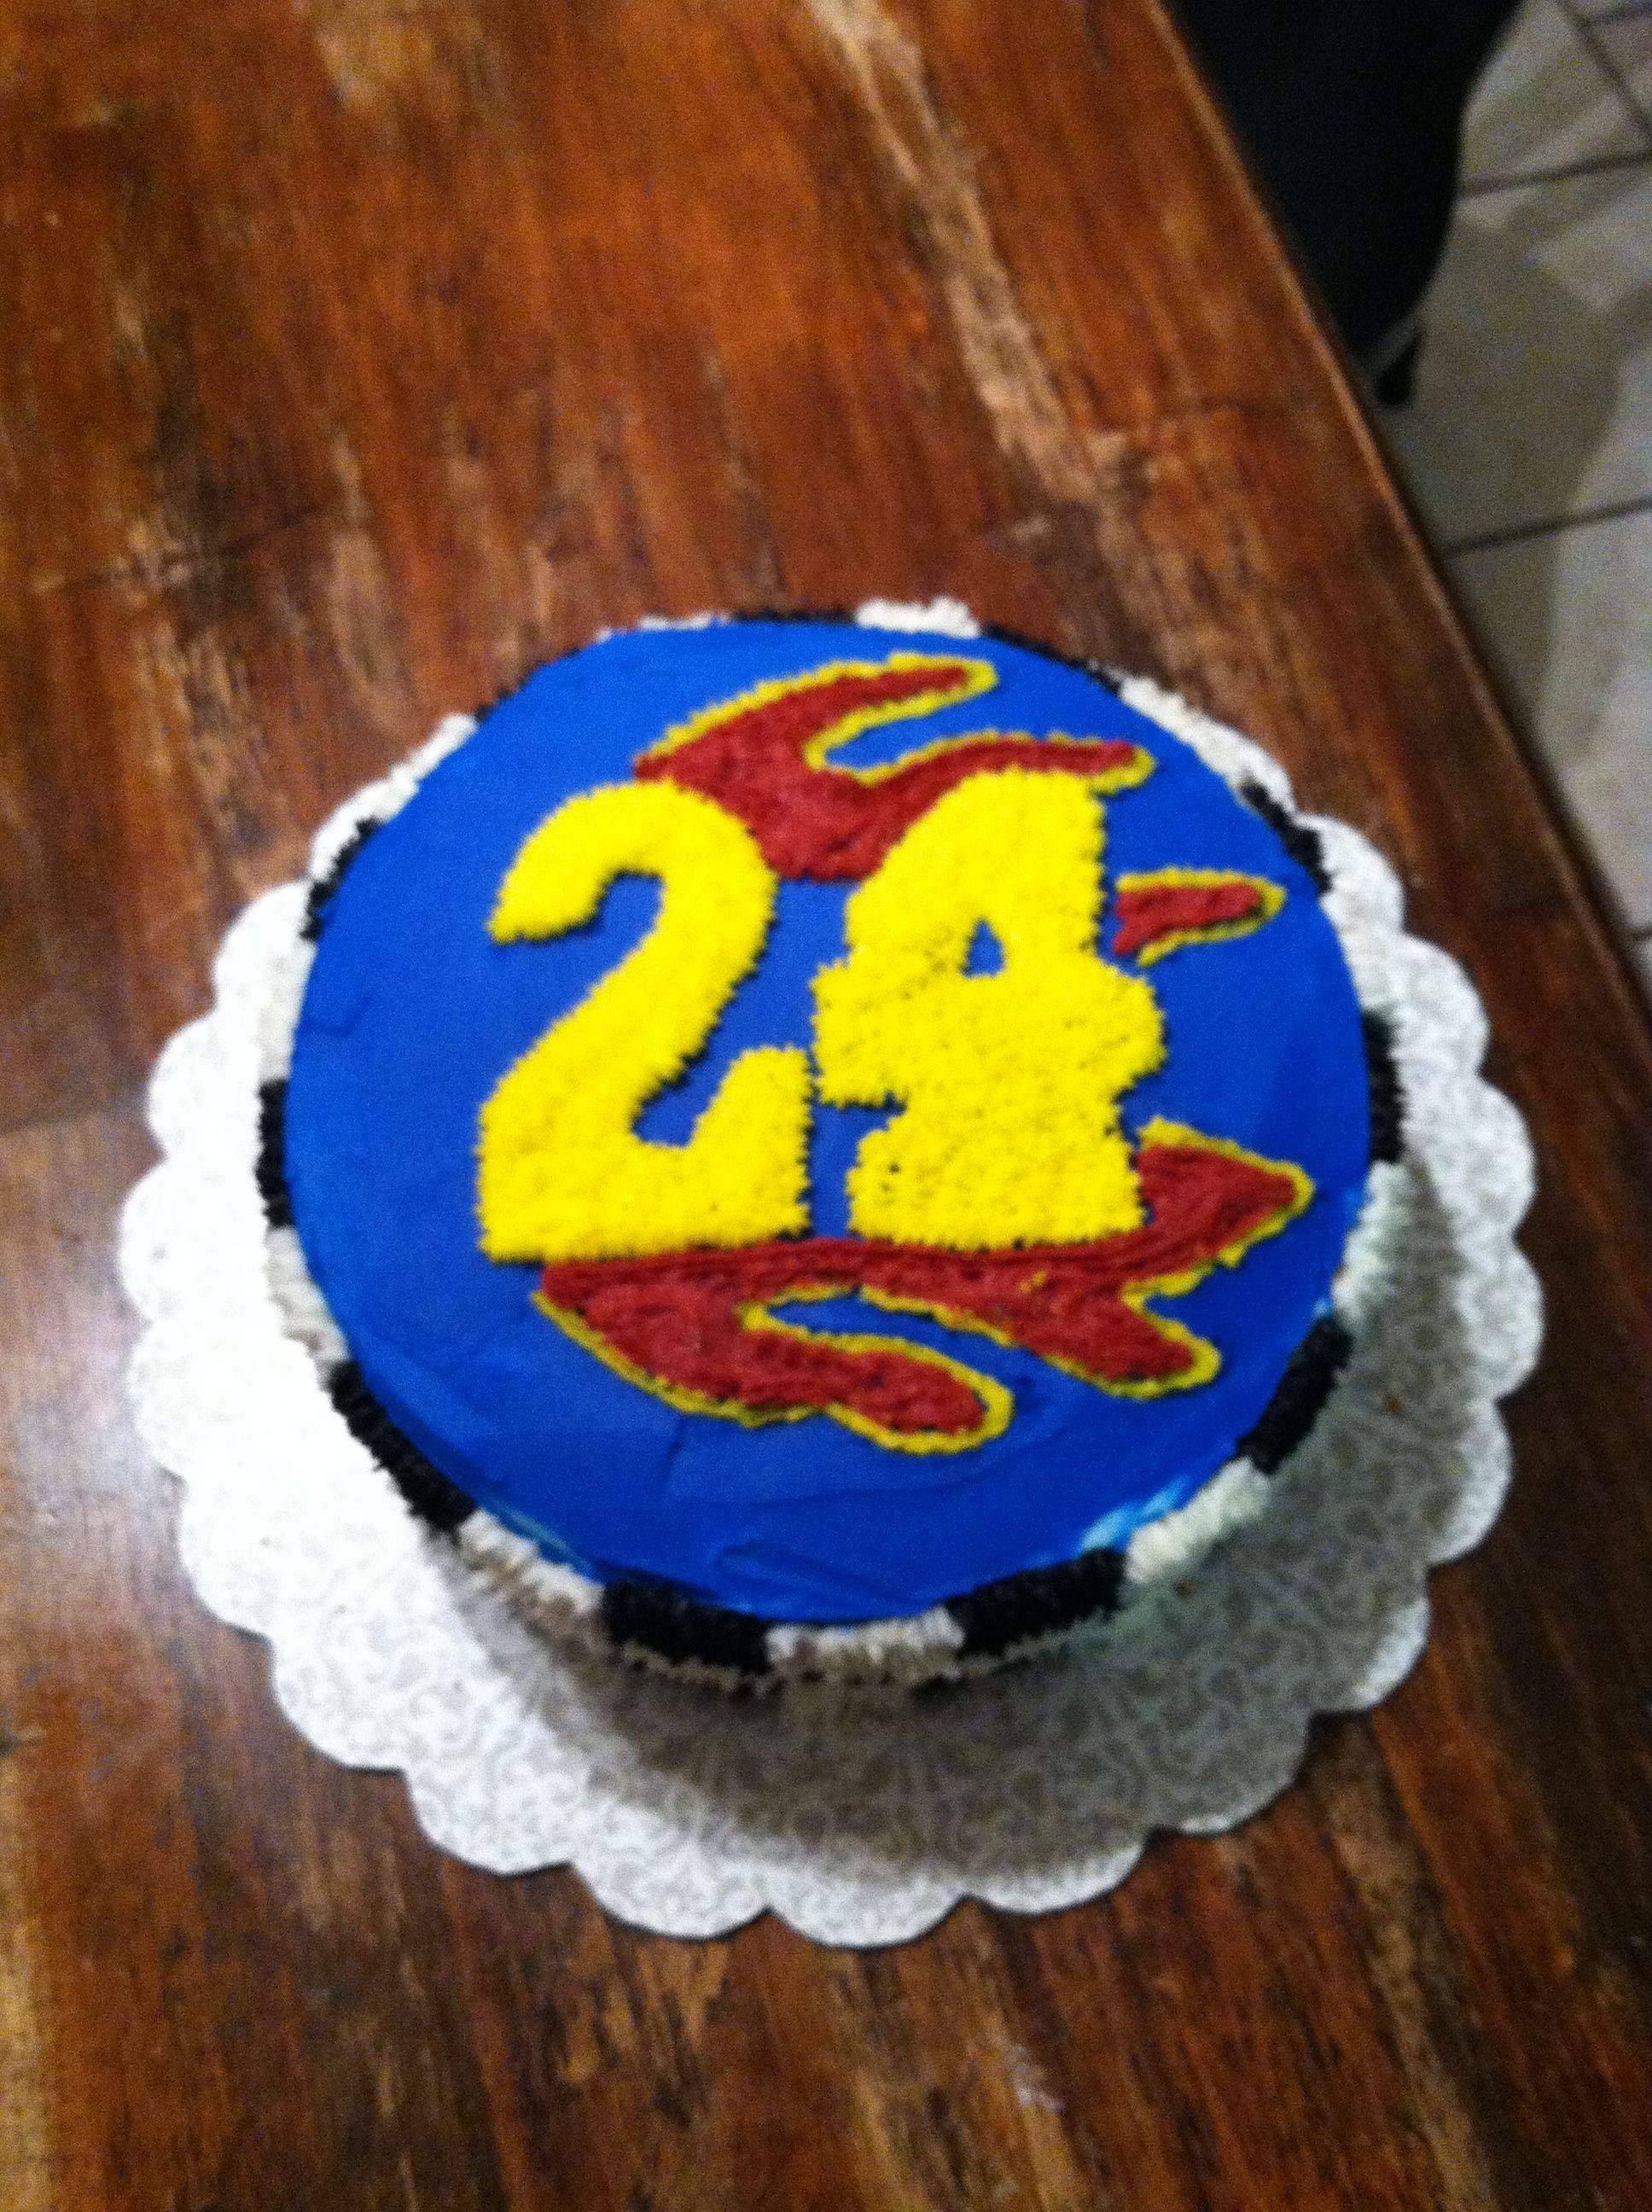 Jeff Gordon Birthday Cake Cookie Decorating Cake Decorating Cake